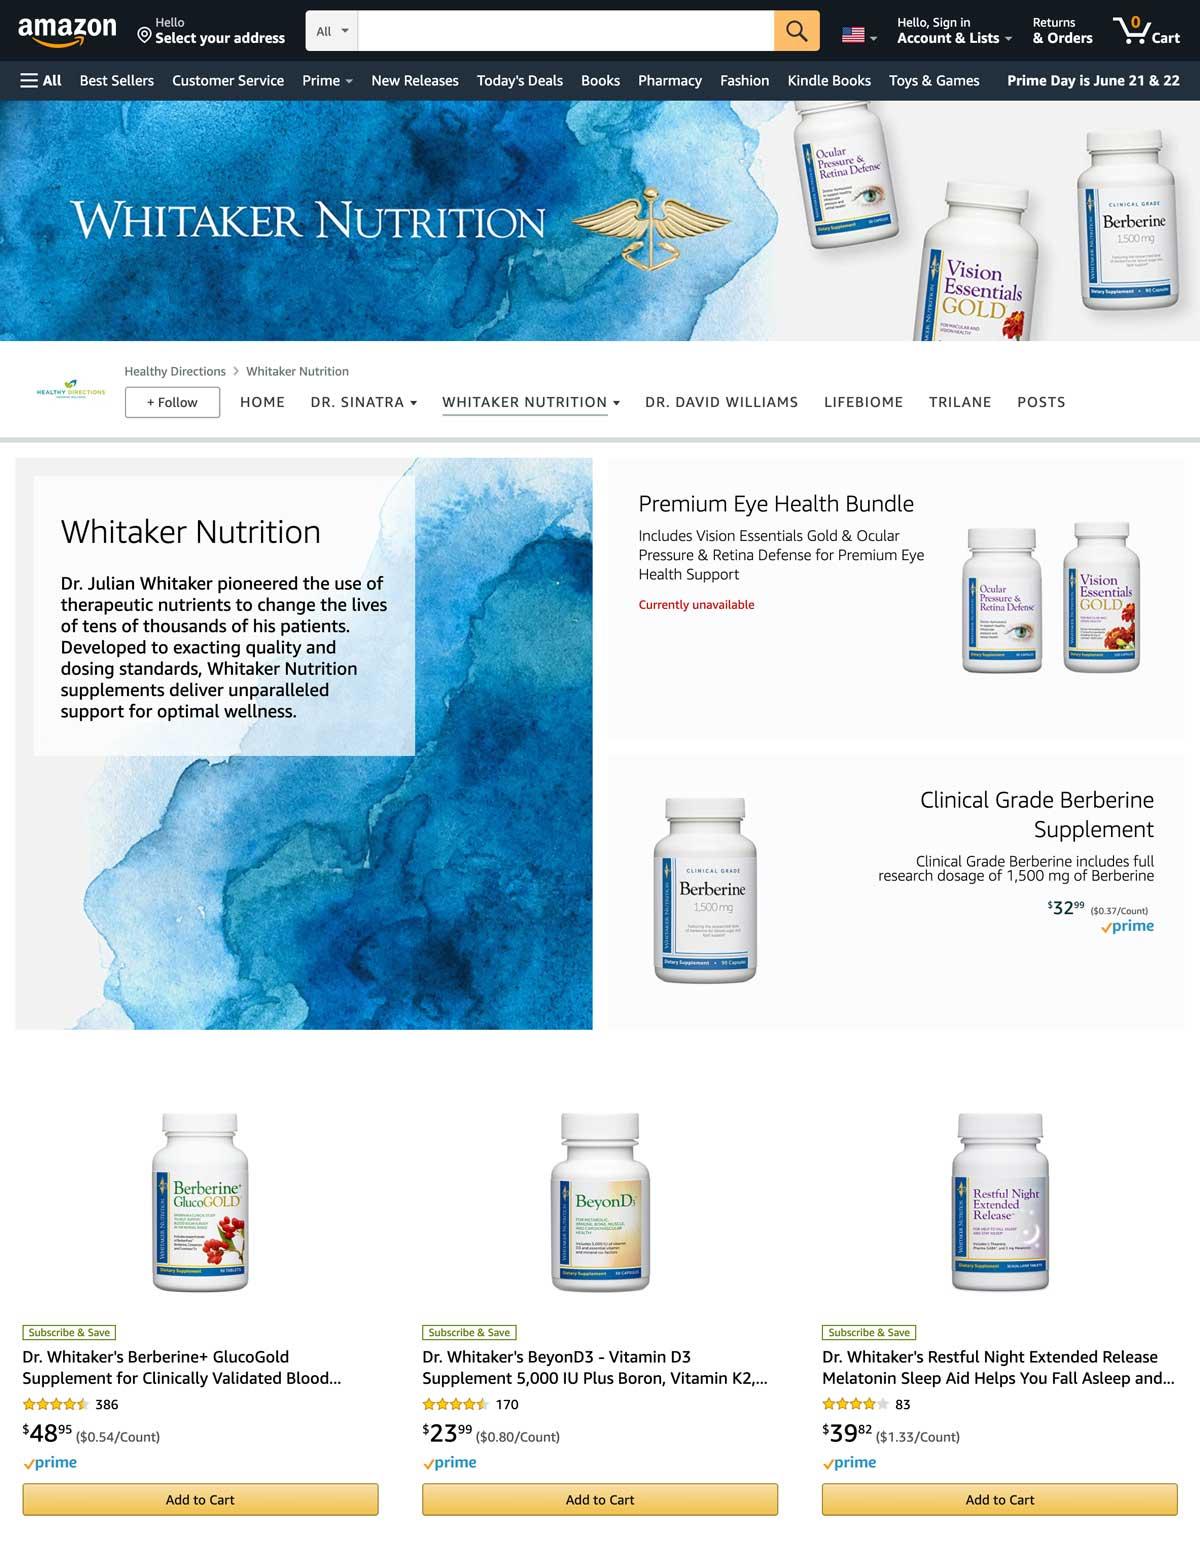 Whitaker Nutrition main Amazon storefront